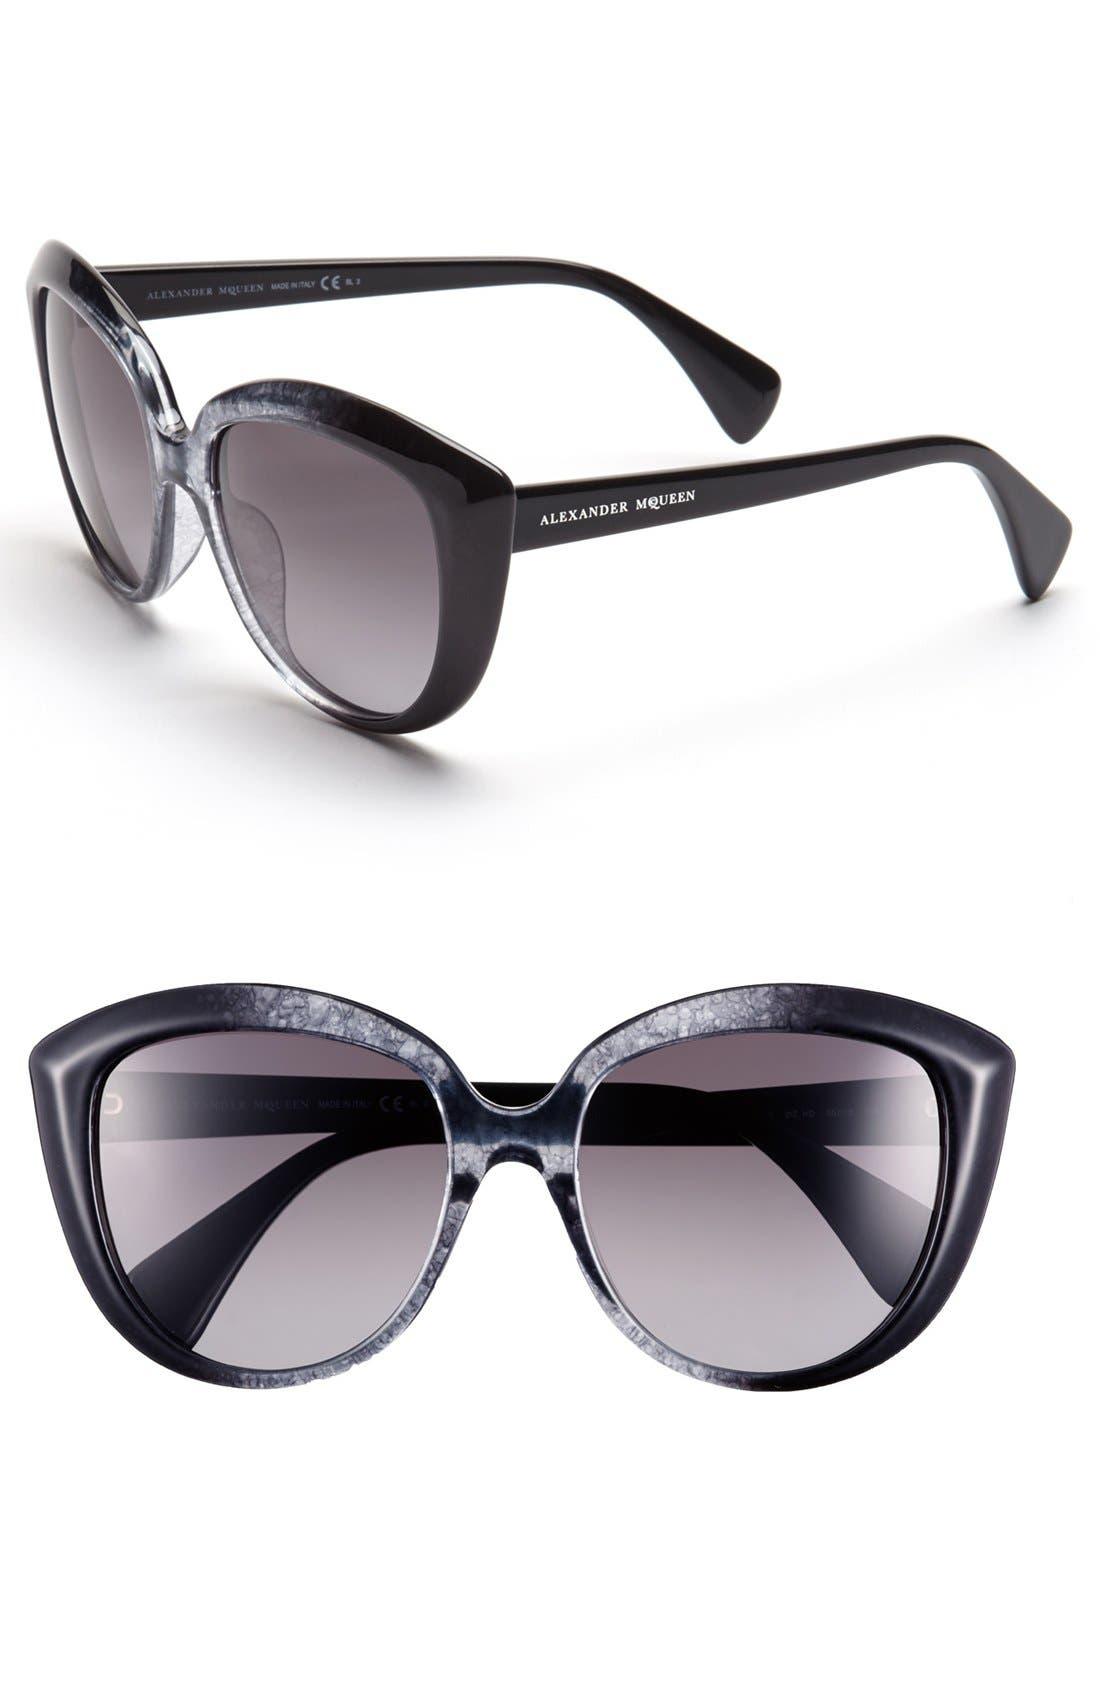 Alternate Image 1 Selected - Alexander McQueen 55mm Gradient Cat Eye Sunglasses